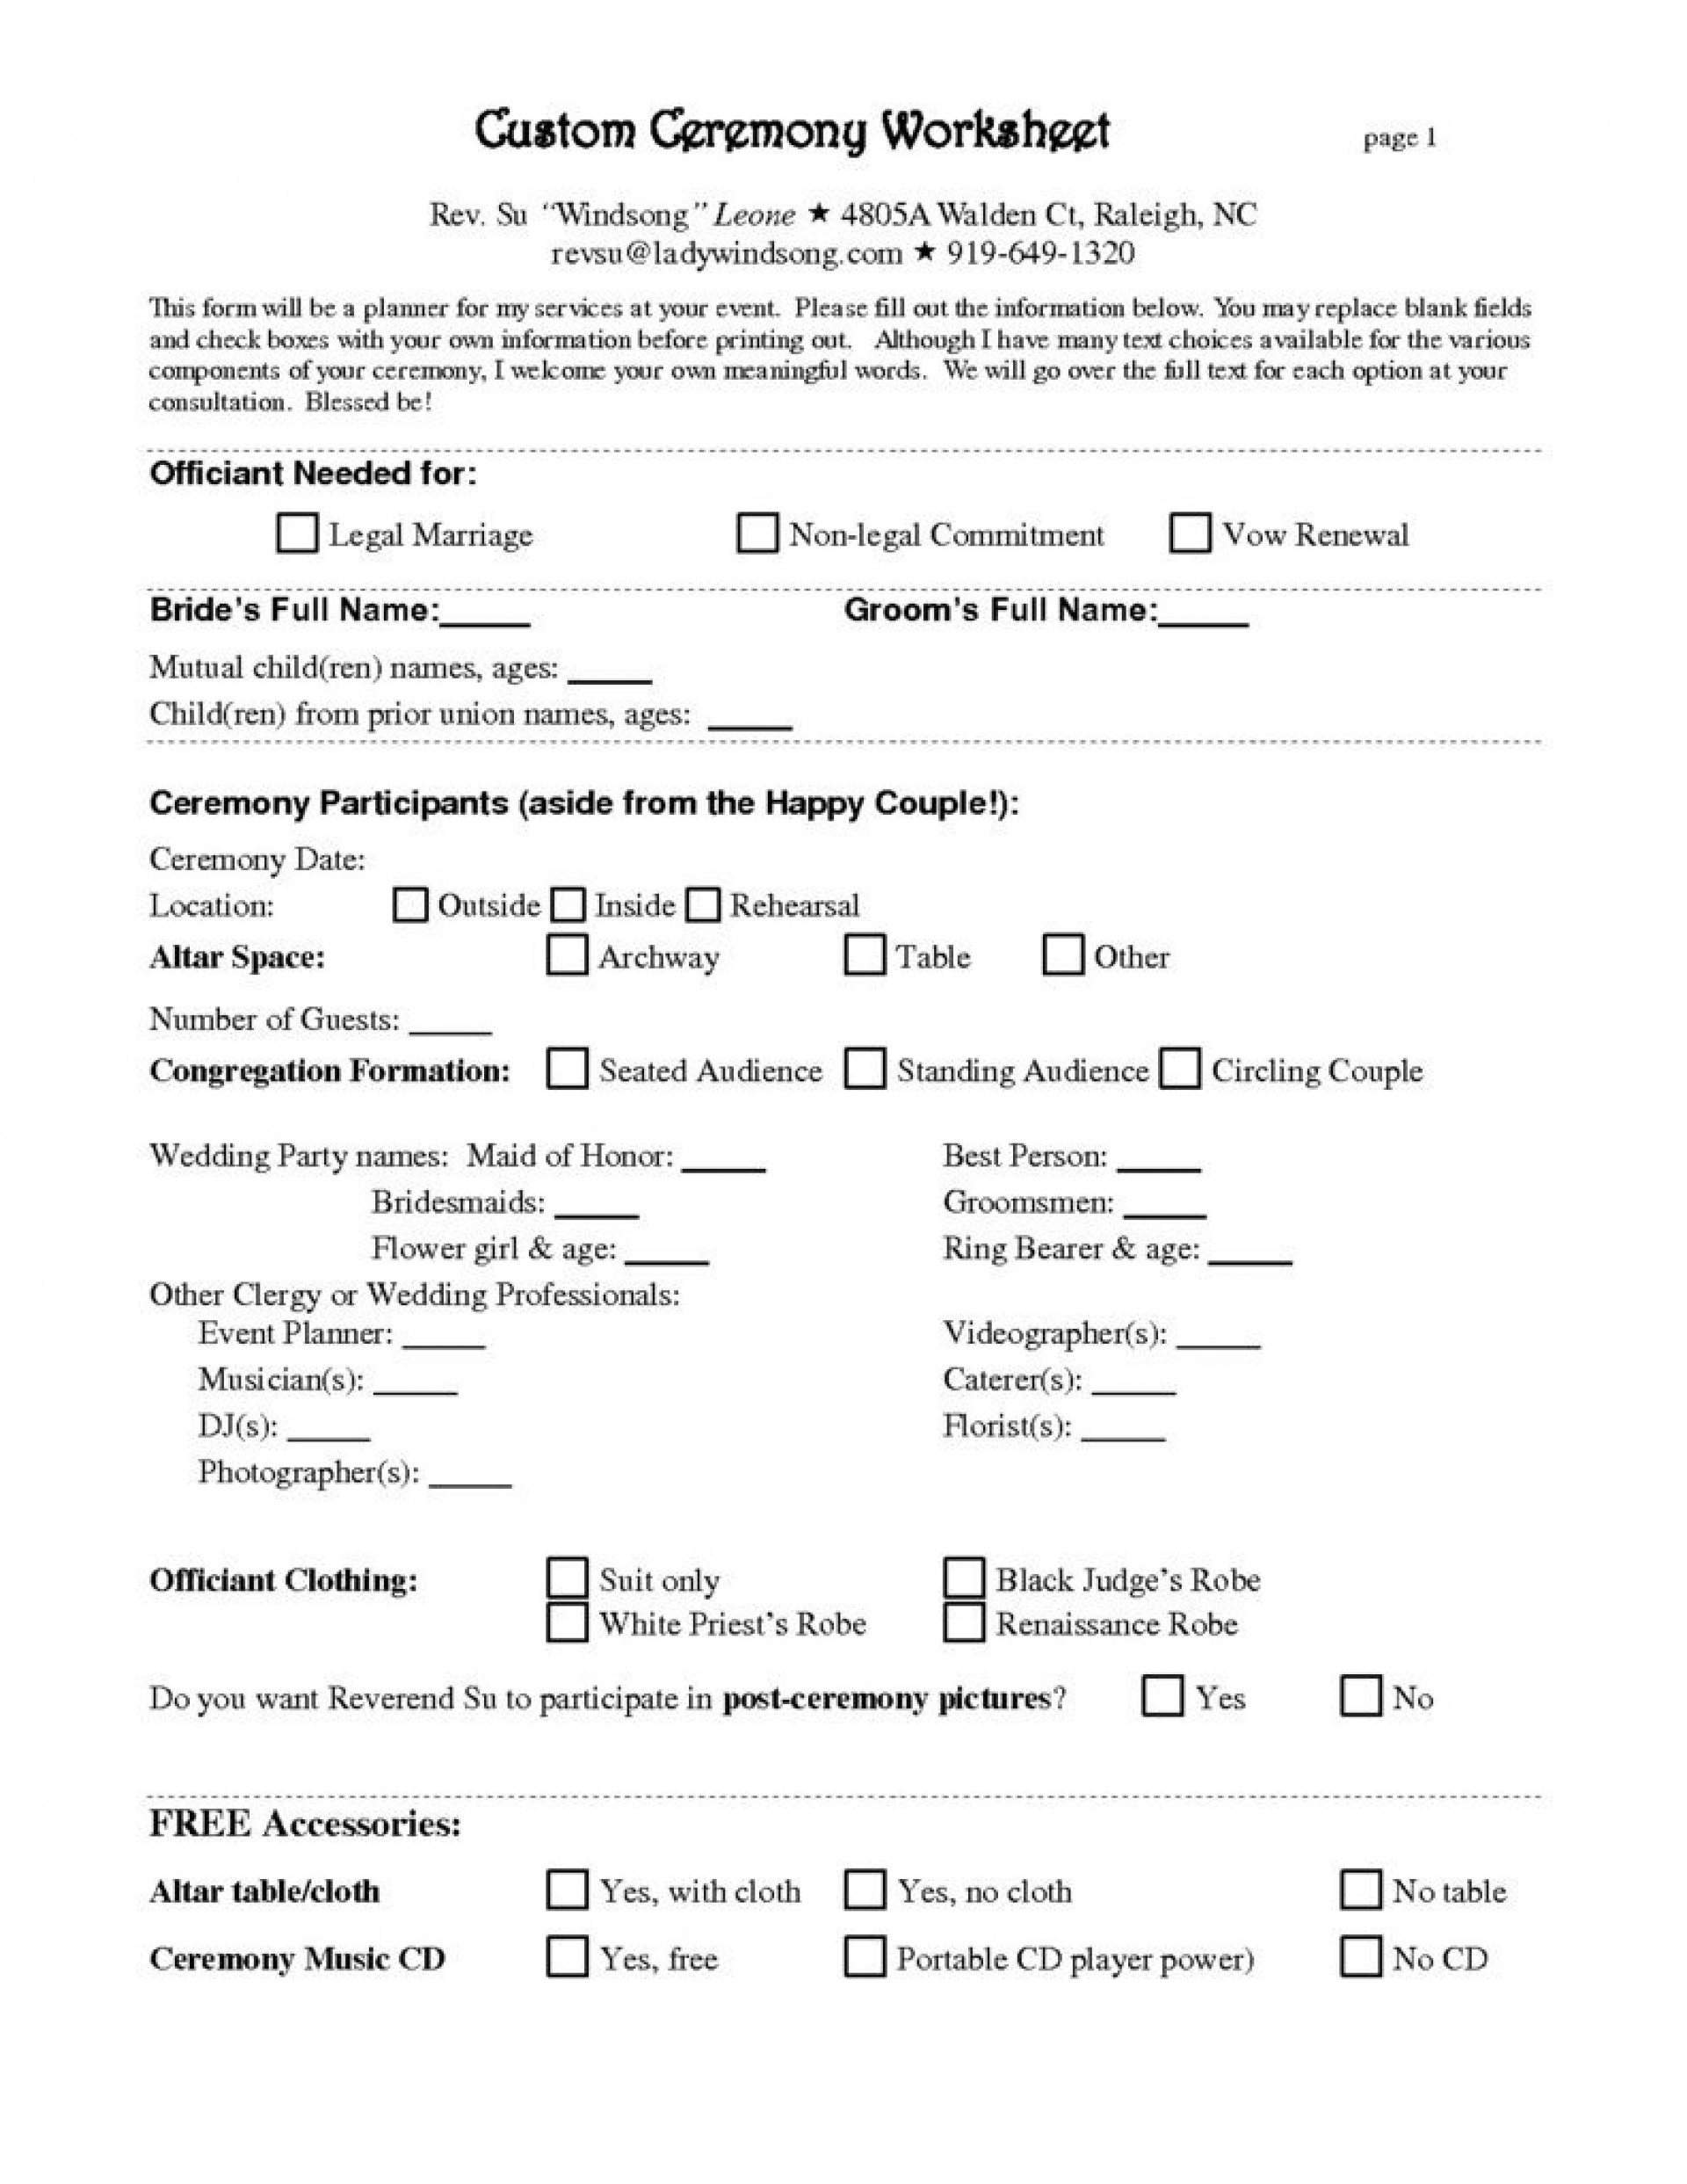 008 Amazing Wedding Planner Contract Template Concept  Word Planning Coordinator Free1920